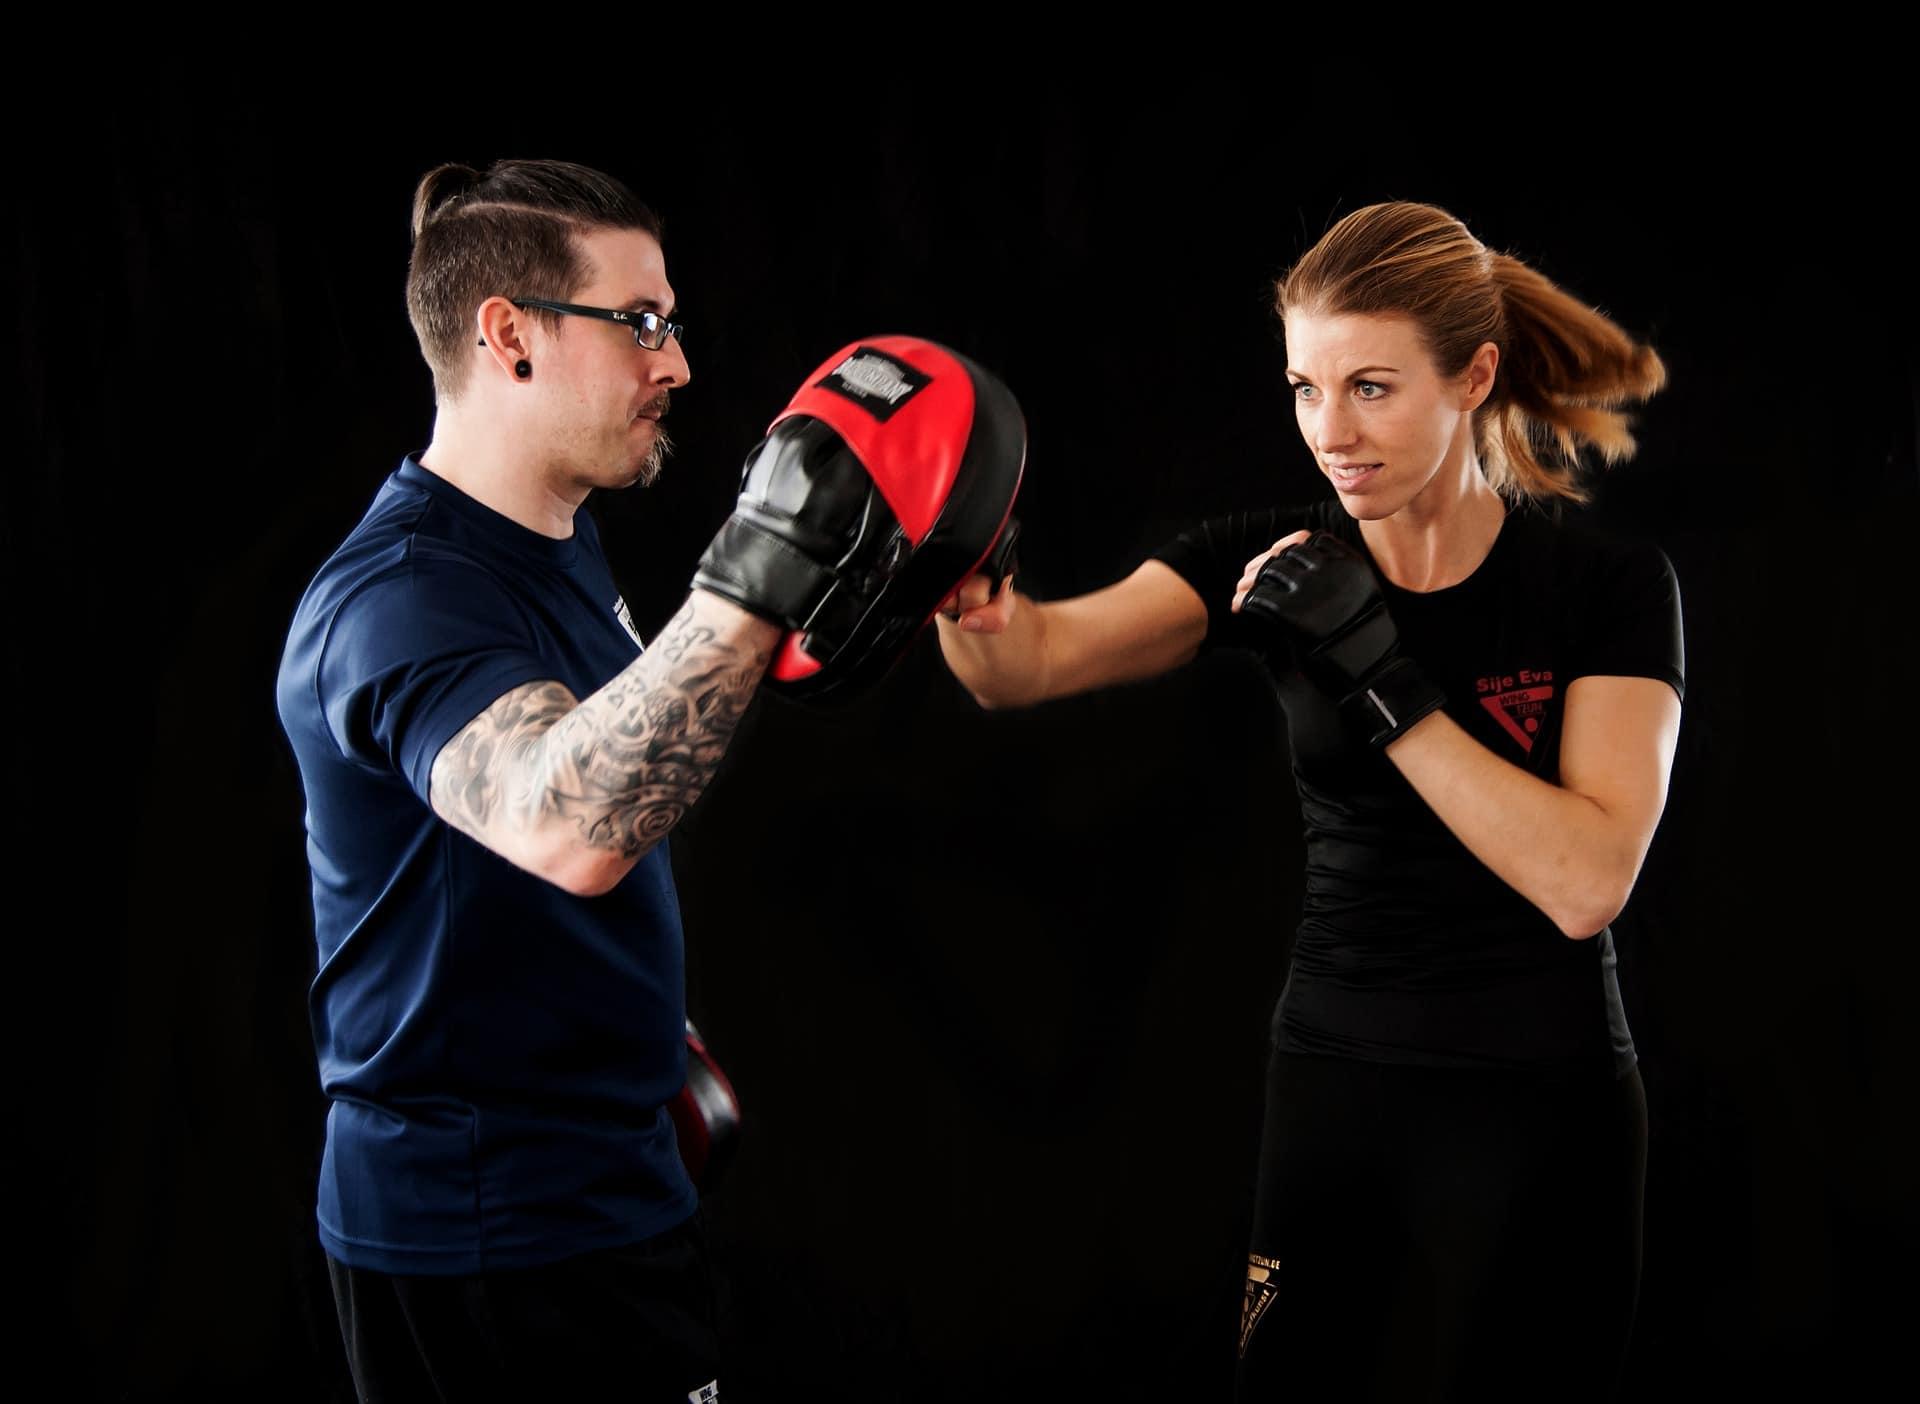 man and woman practicing martial arts